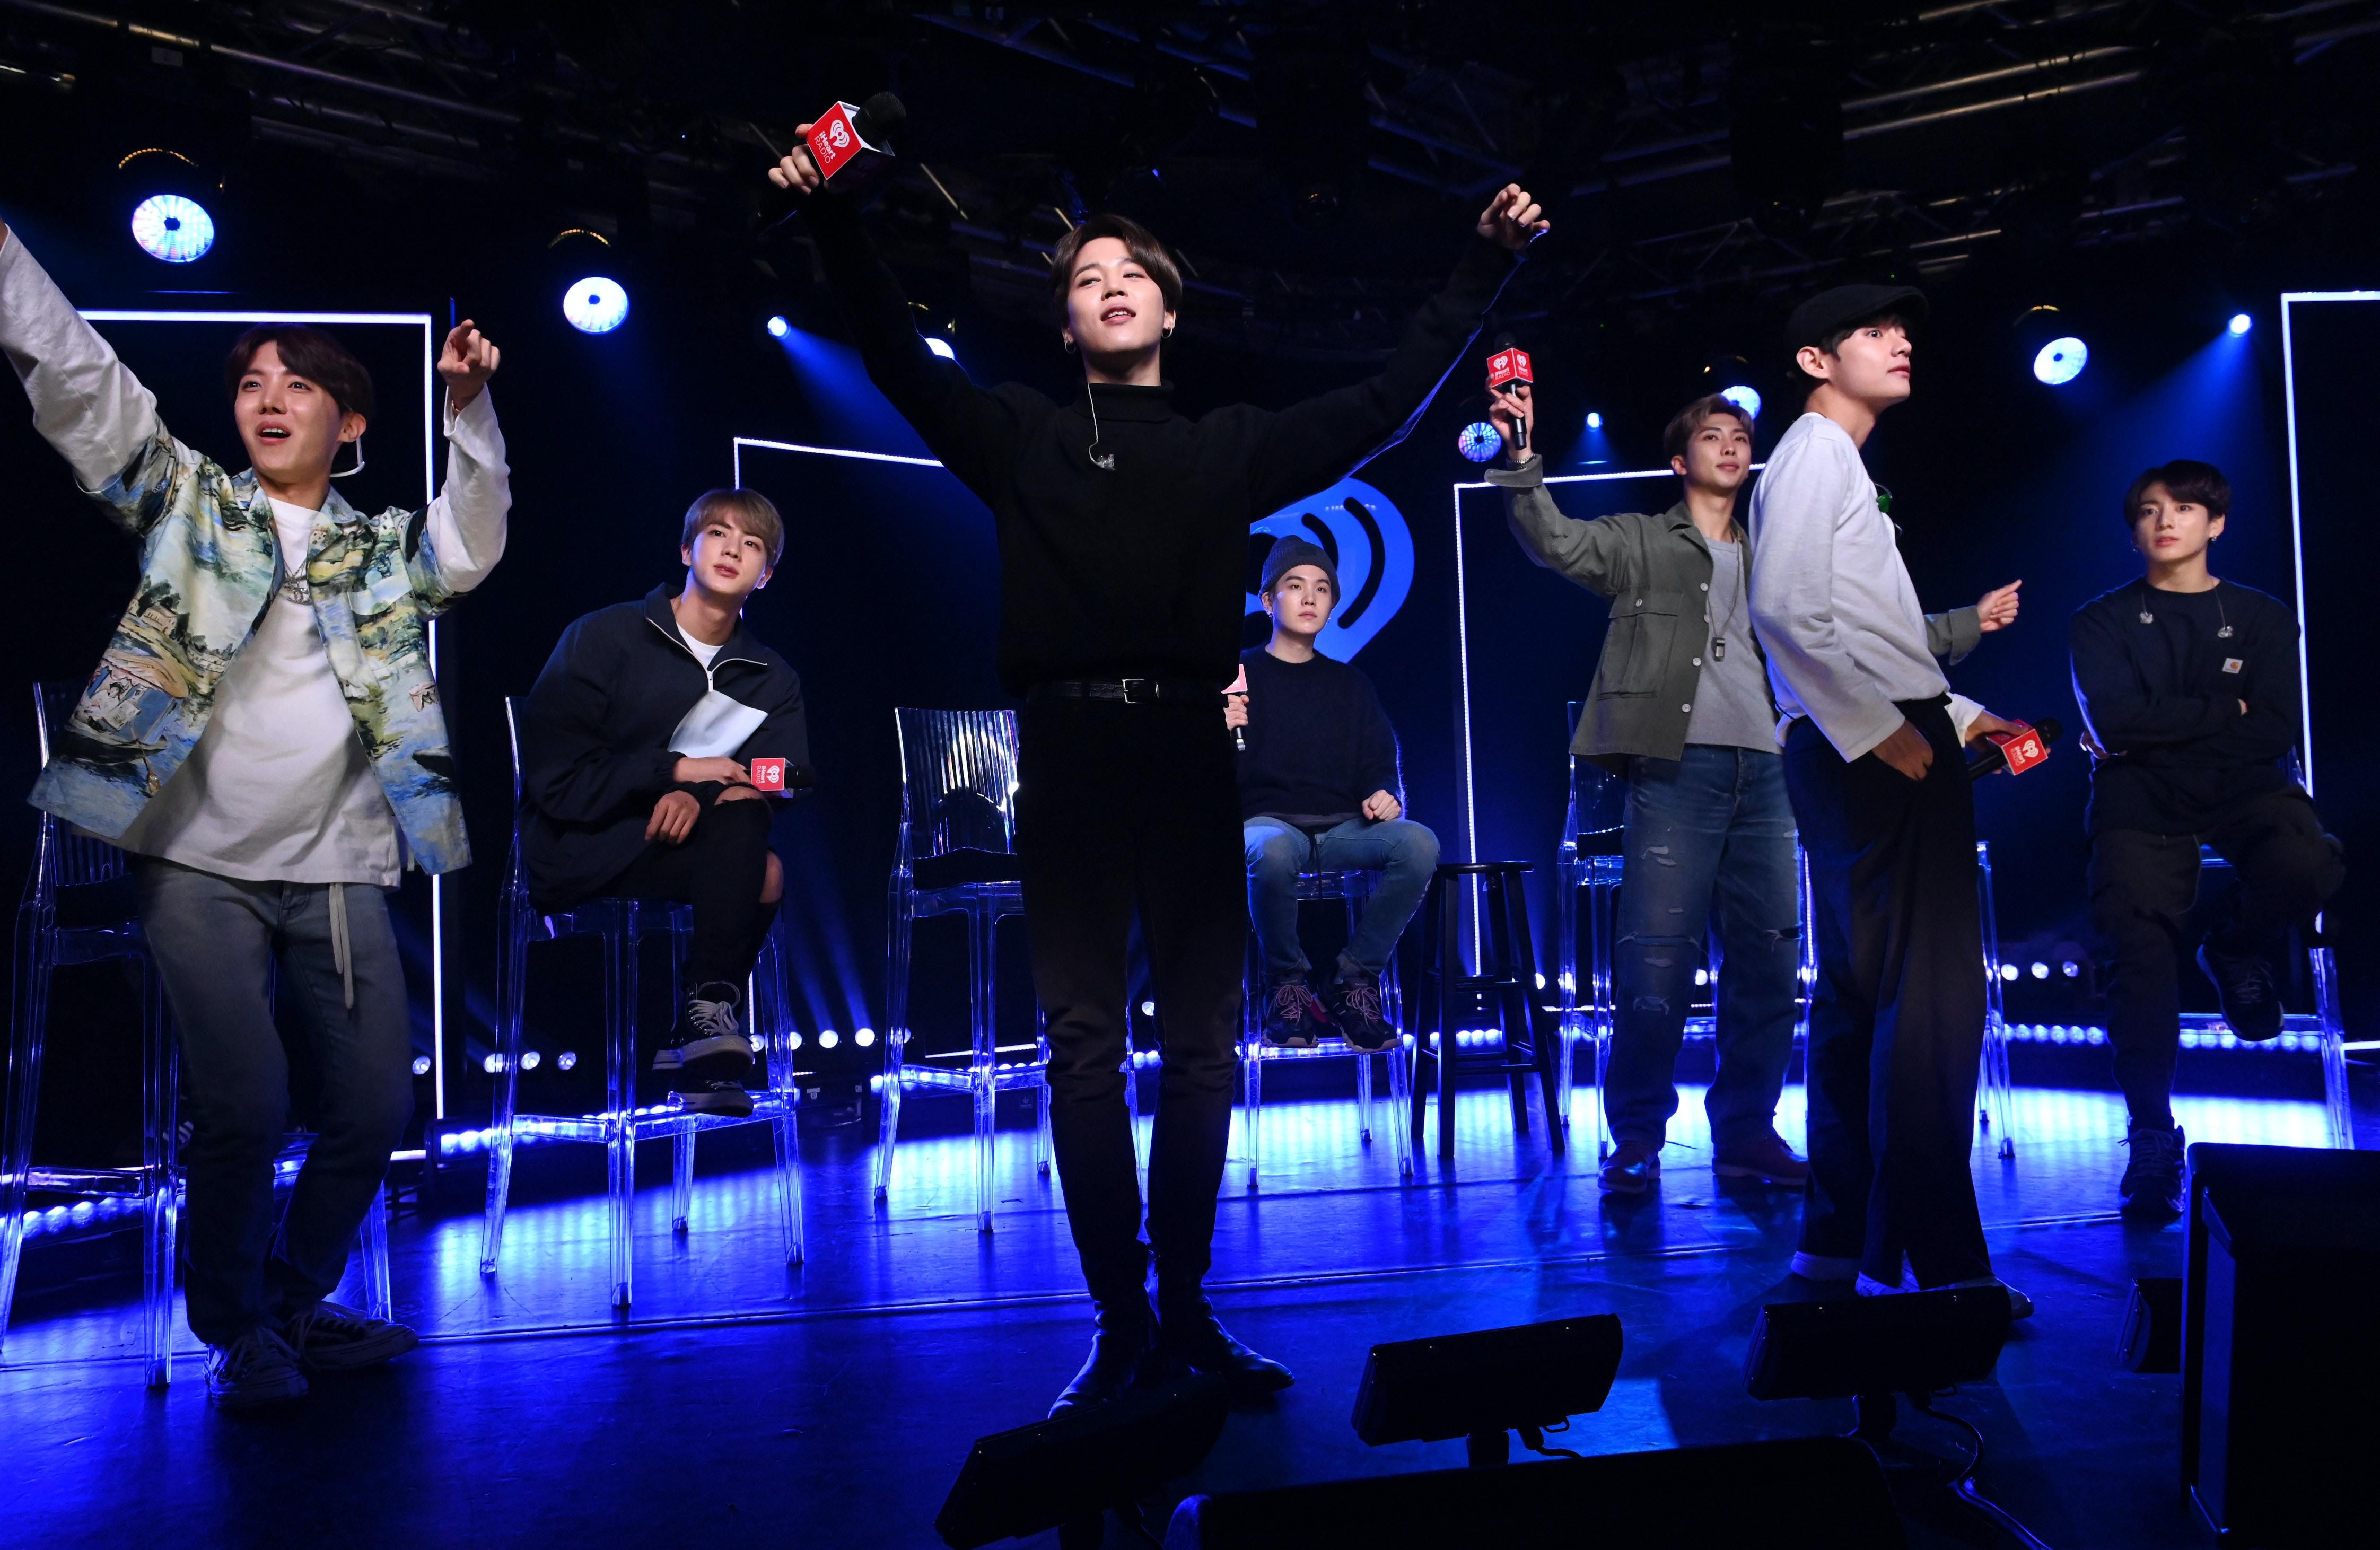 What Is Weverse? BTS & TXT's New Official Fan Community App